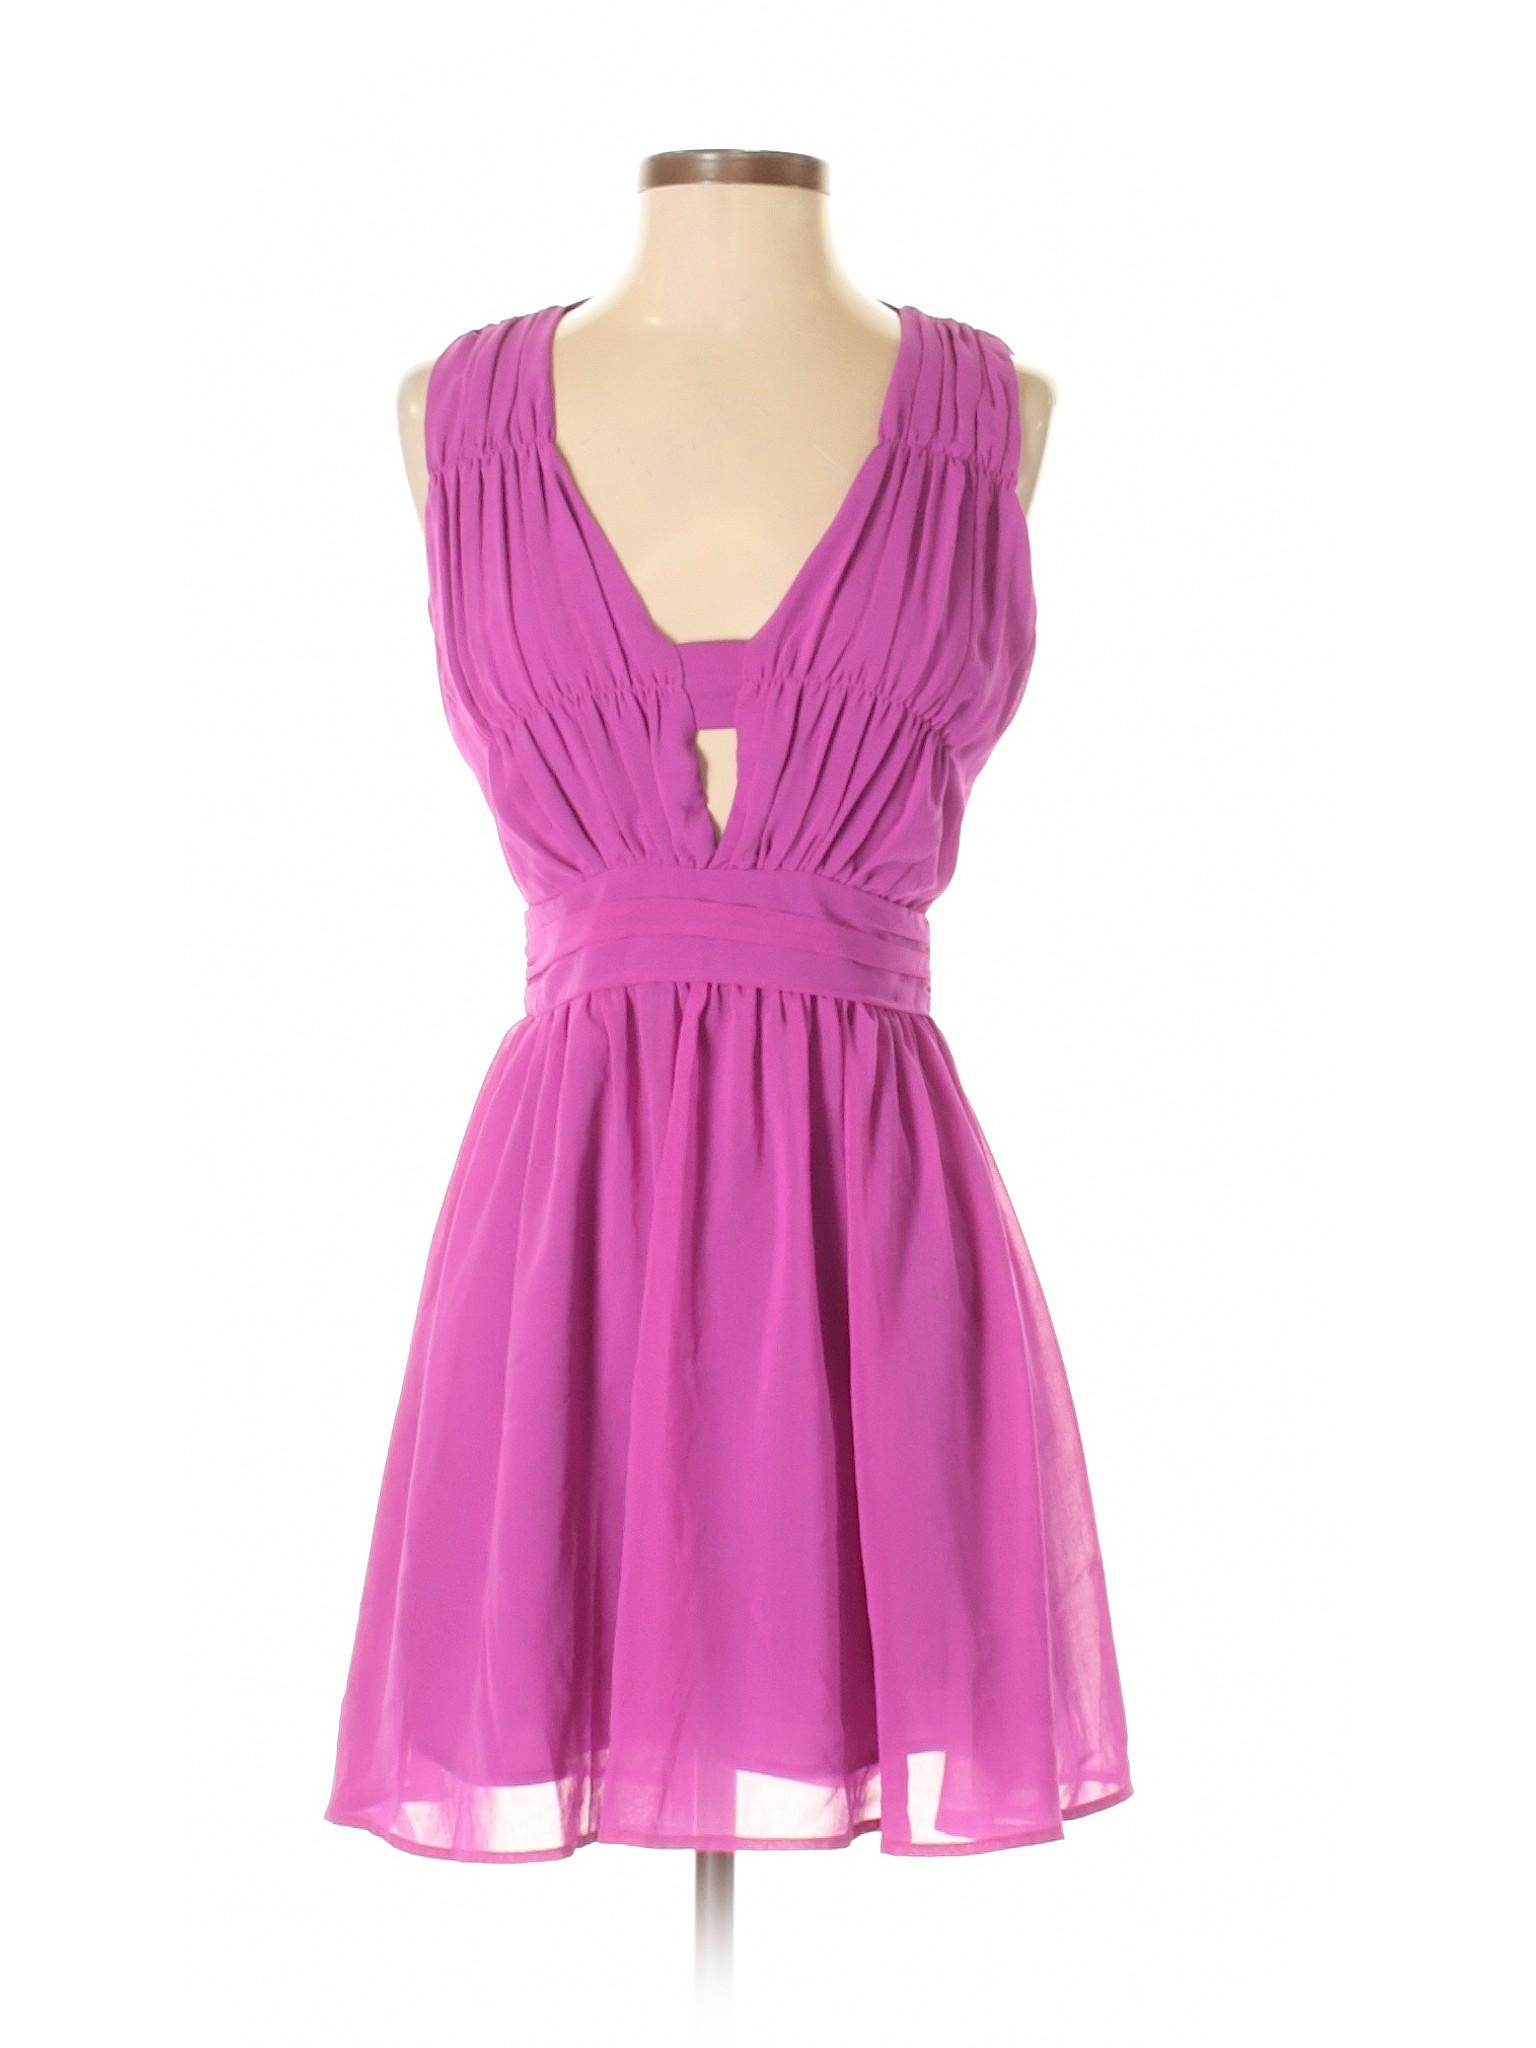 Dress Dress Selling Keepsake Keepsake Casual Selling Casual Keepsake Selling Ow4qTdT